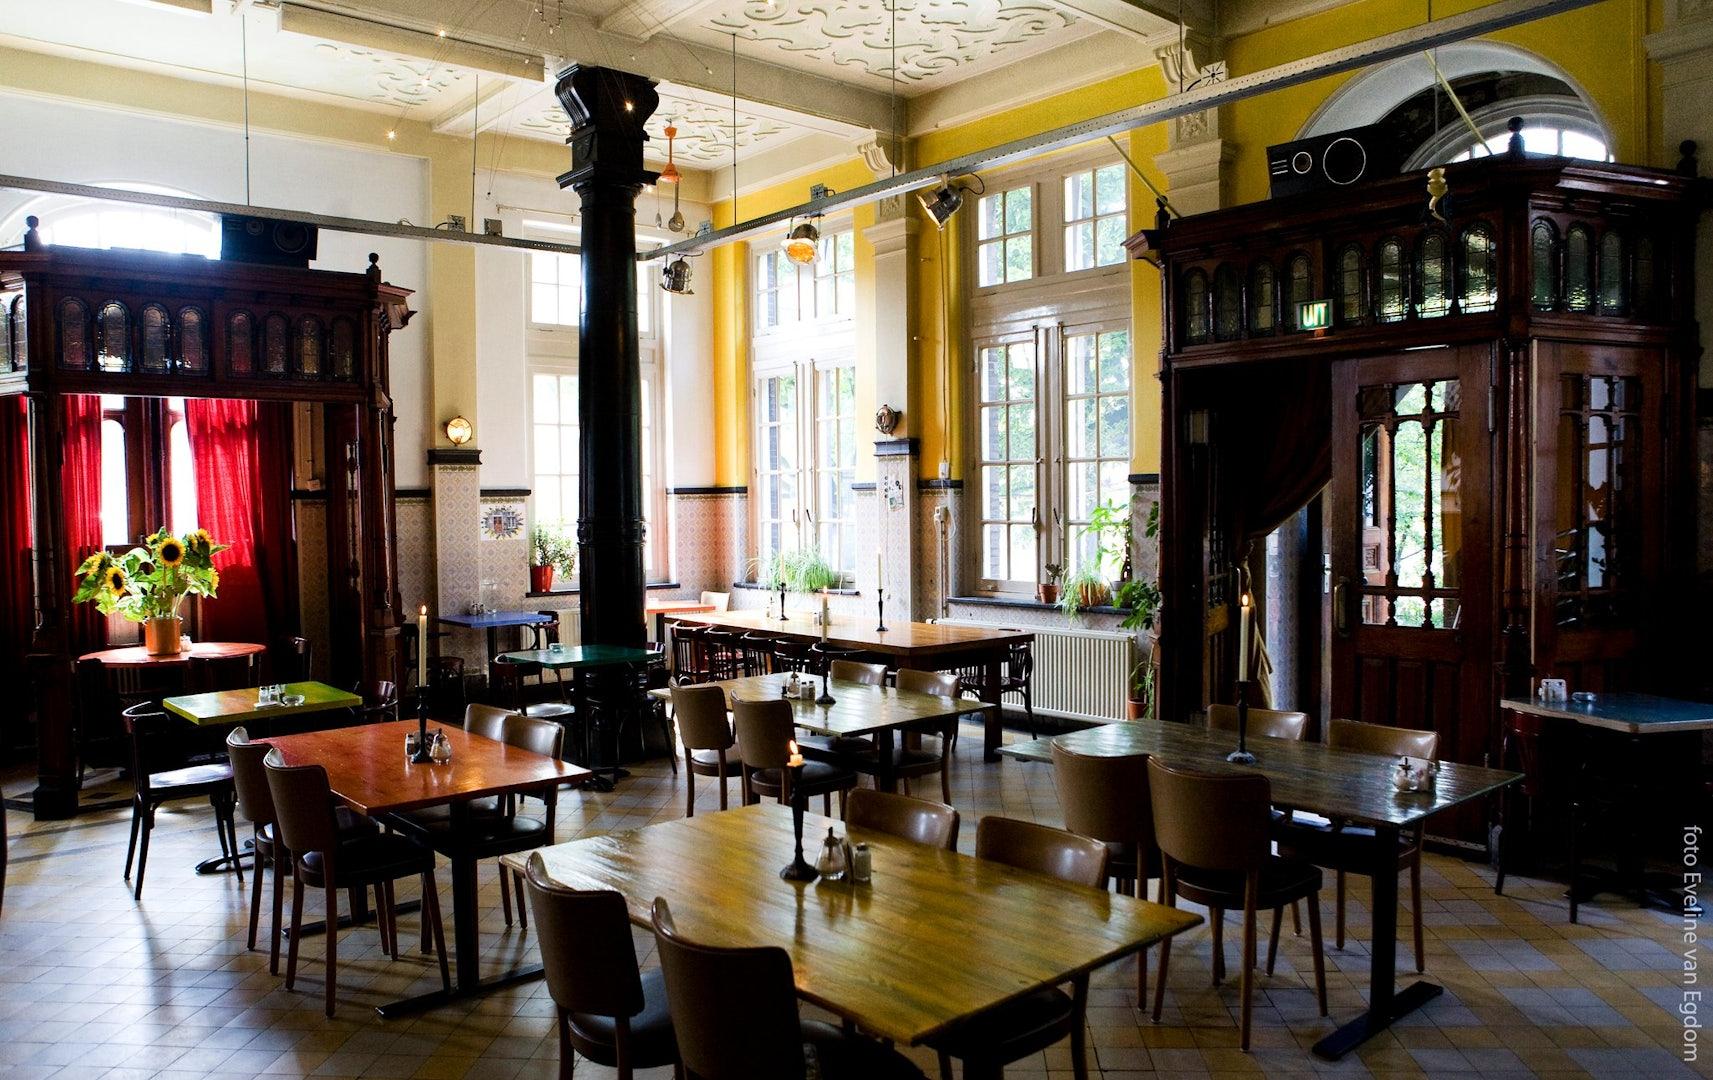 restaurant interior of Hagedis